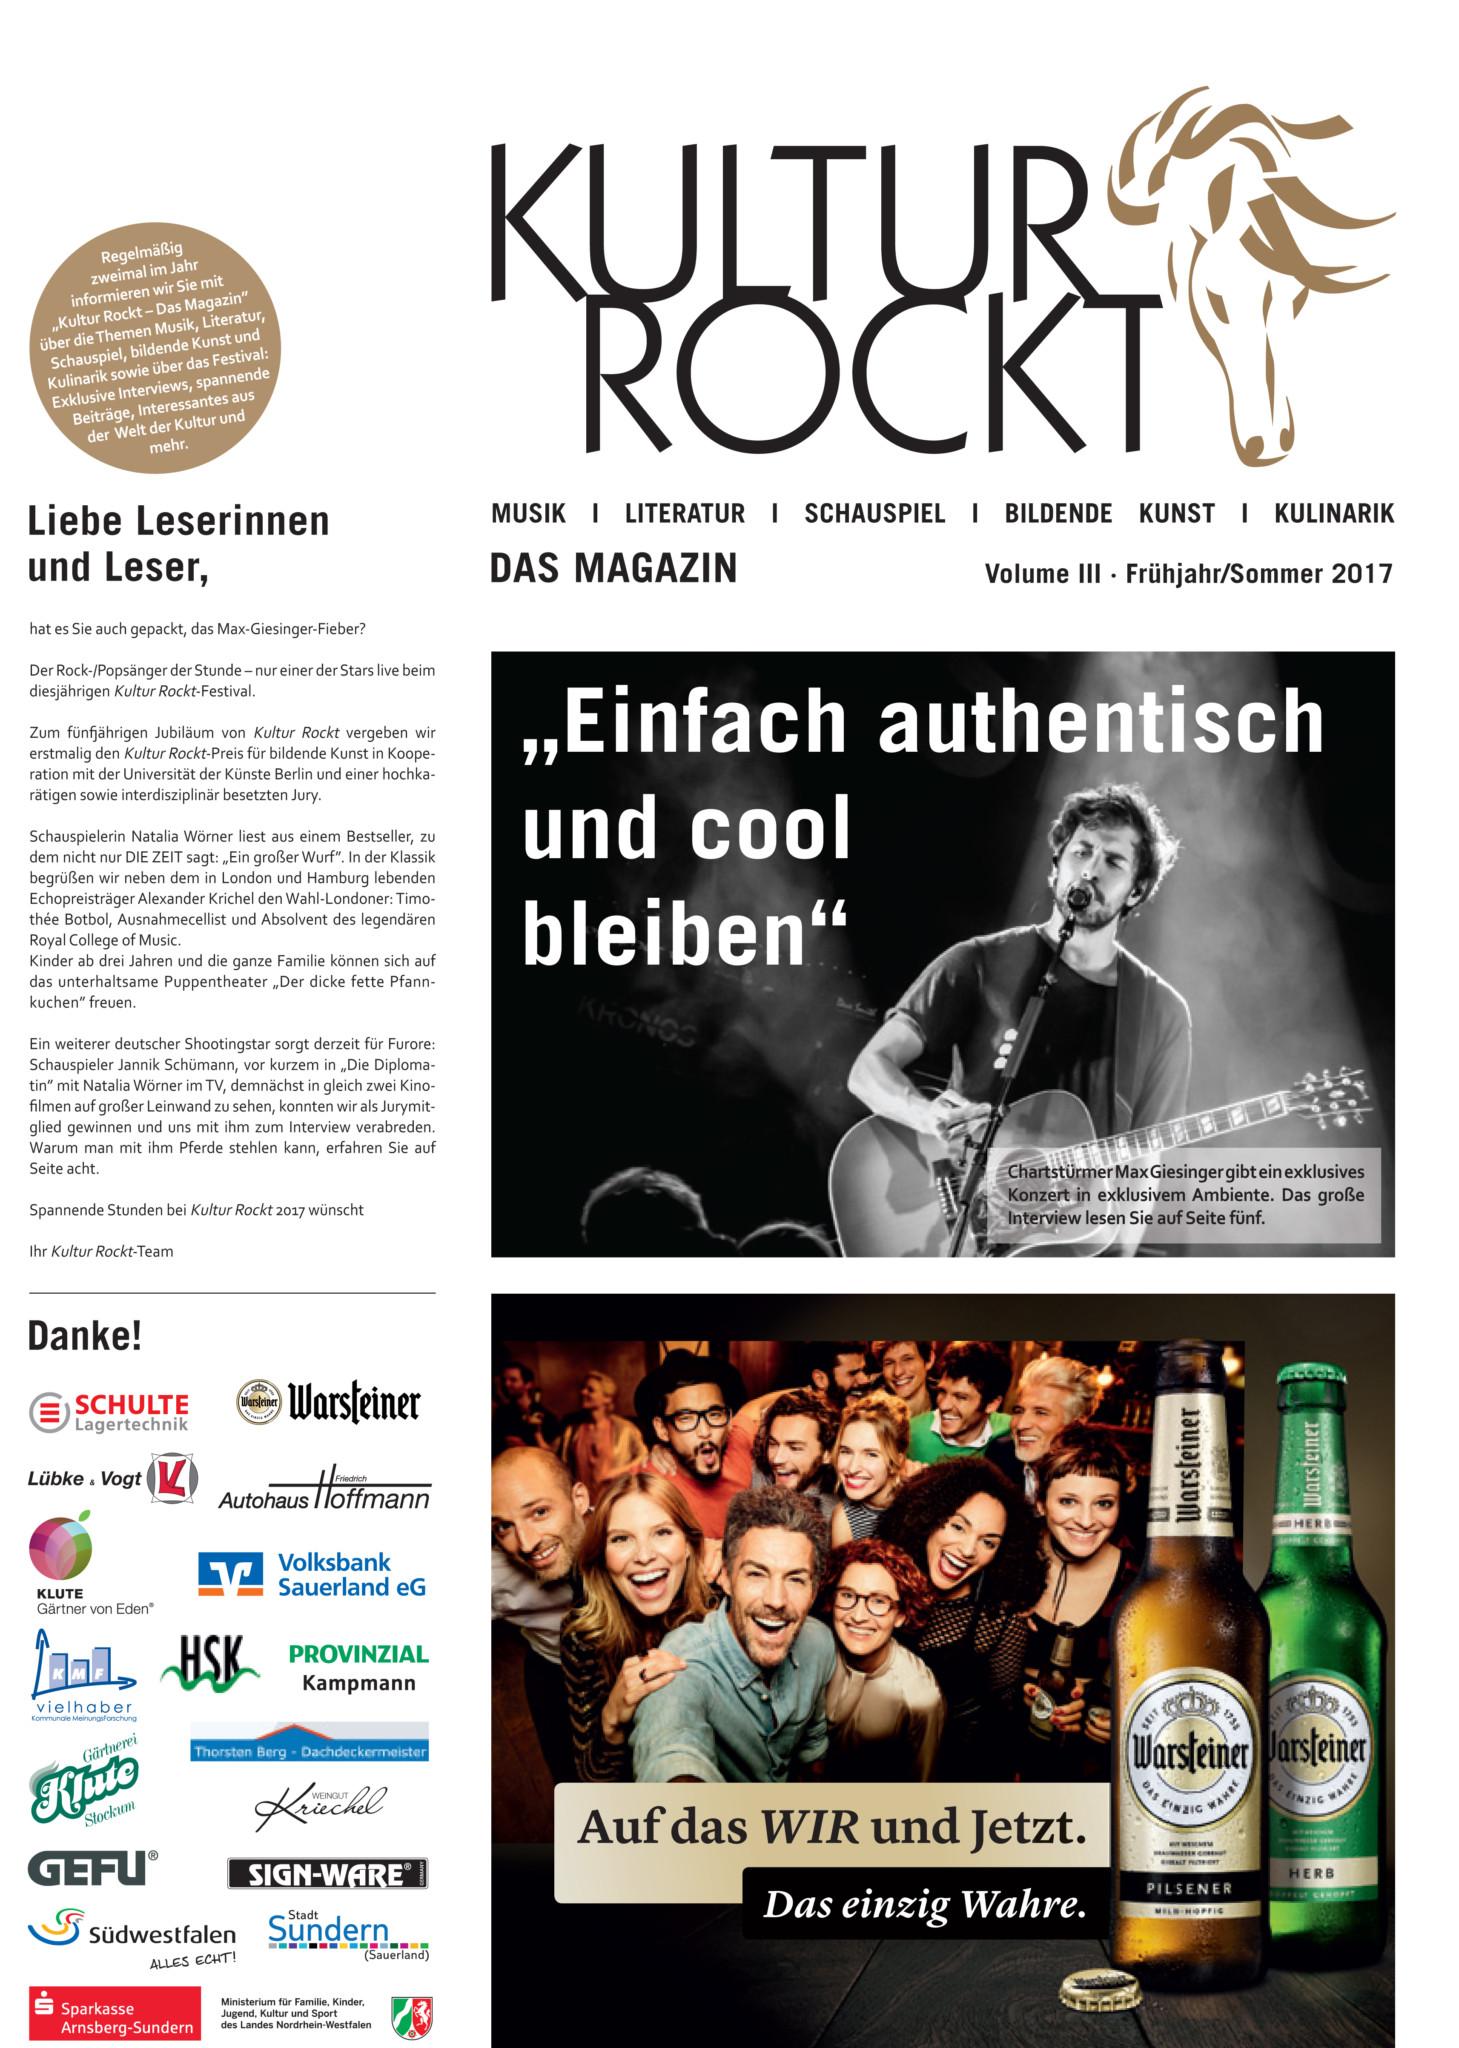 Kultur Rockt – Das Magazin Vol.III